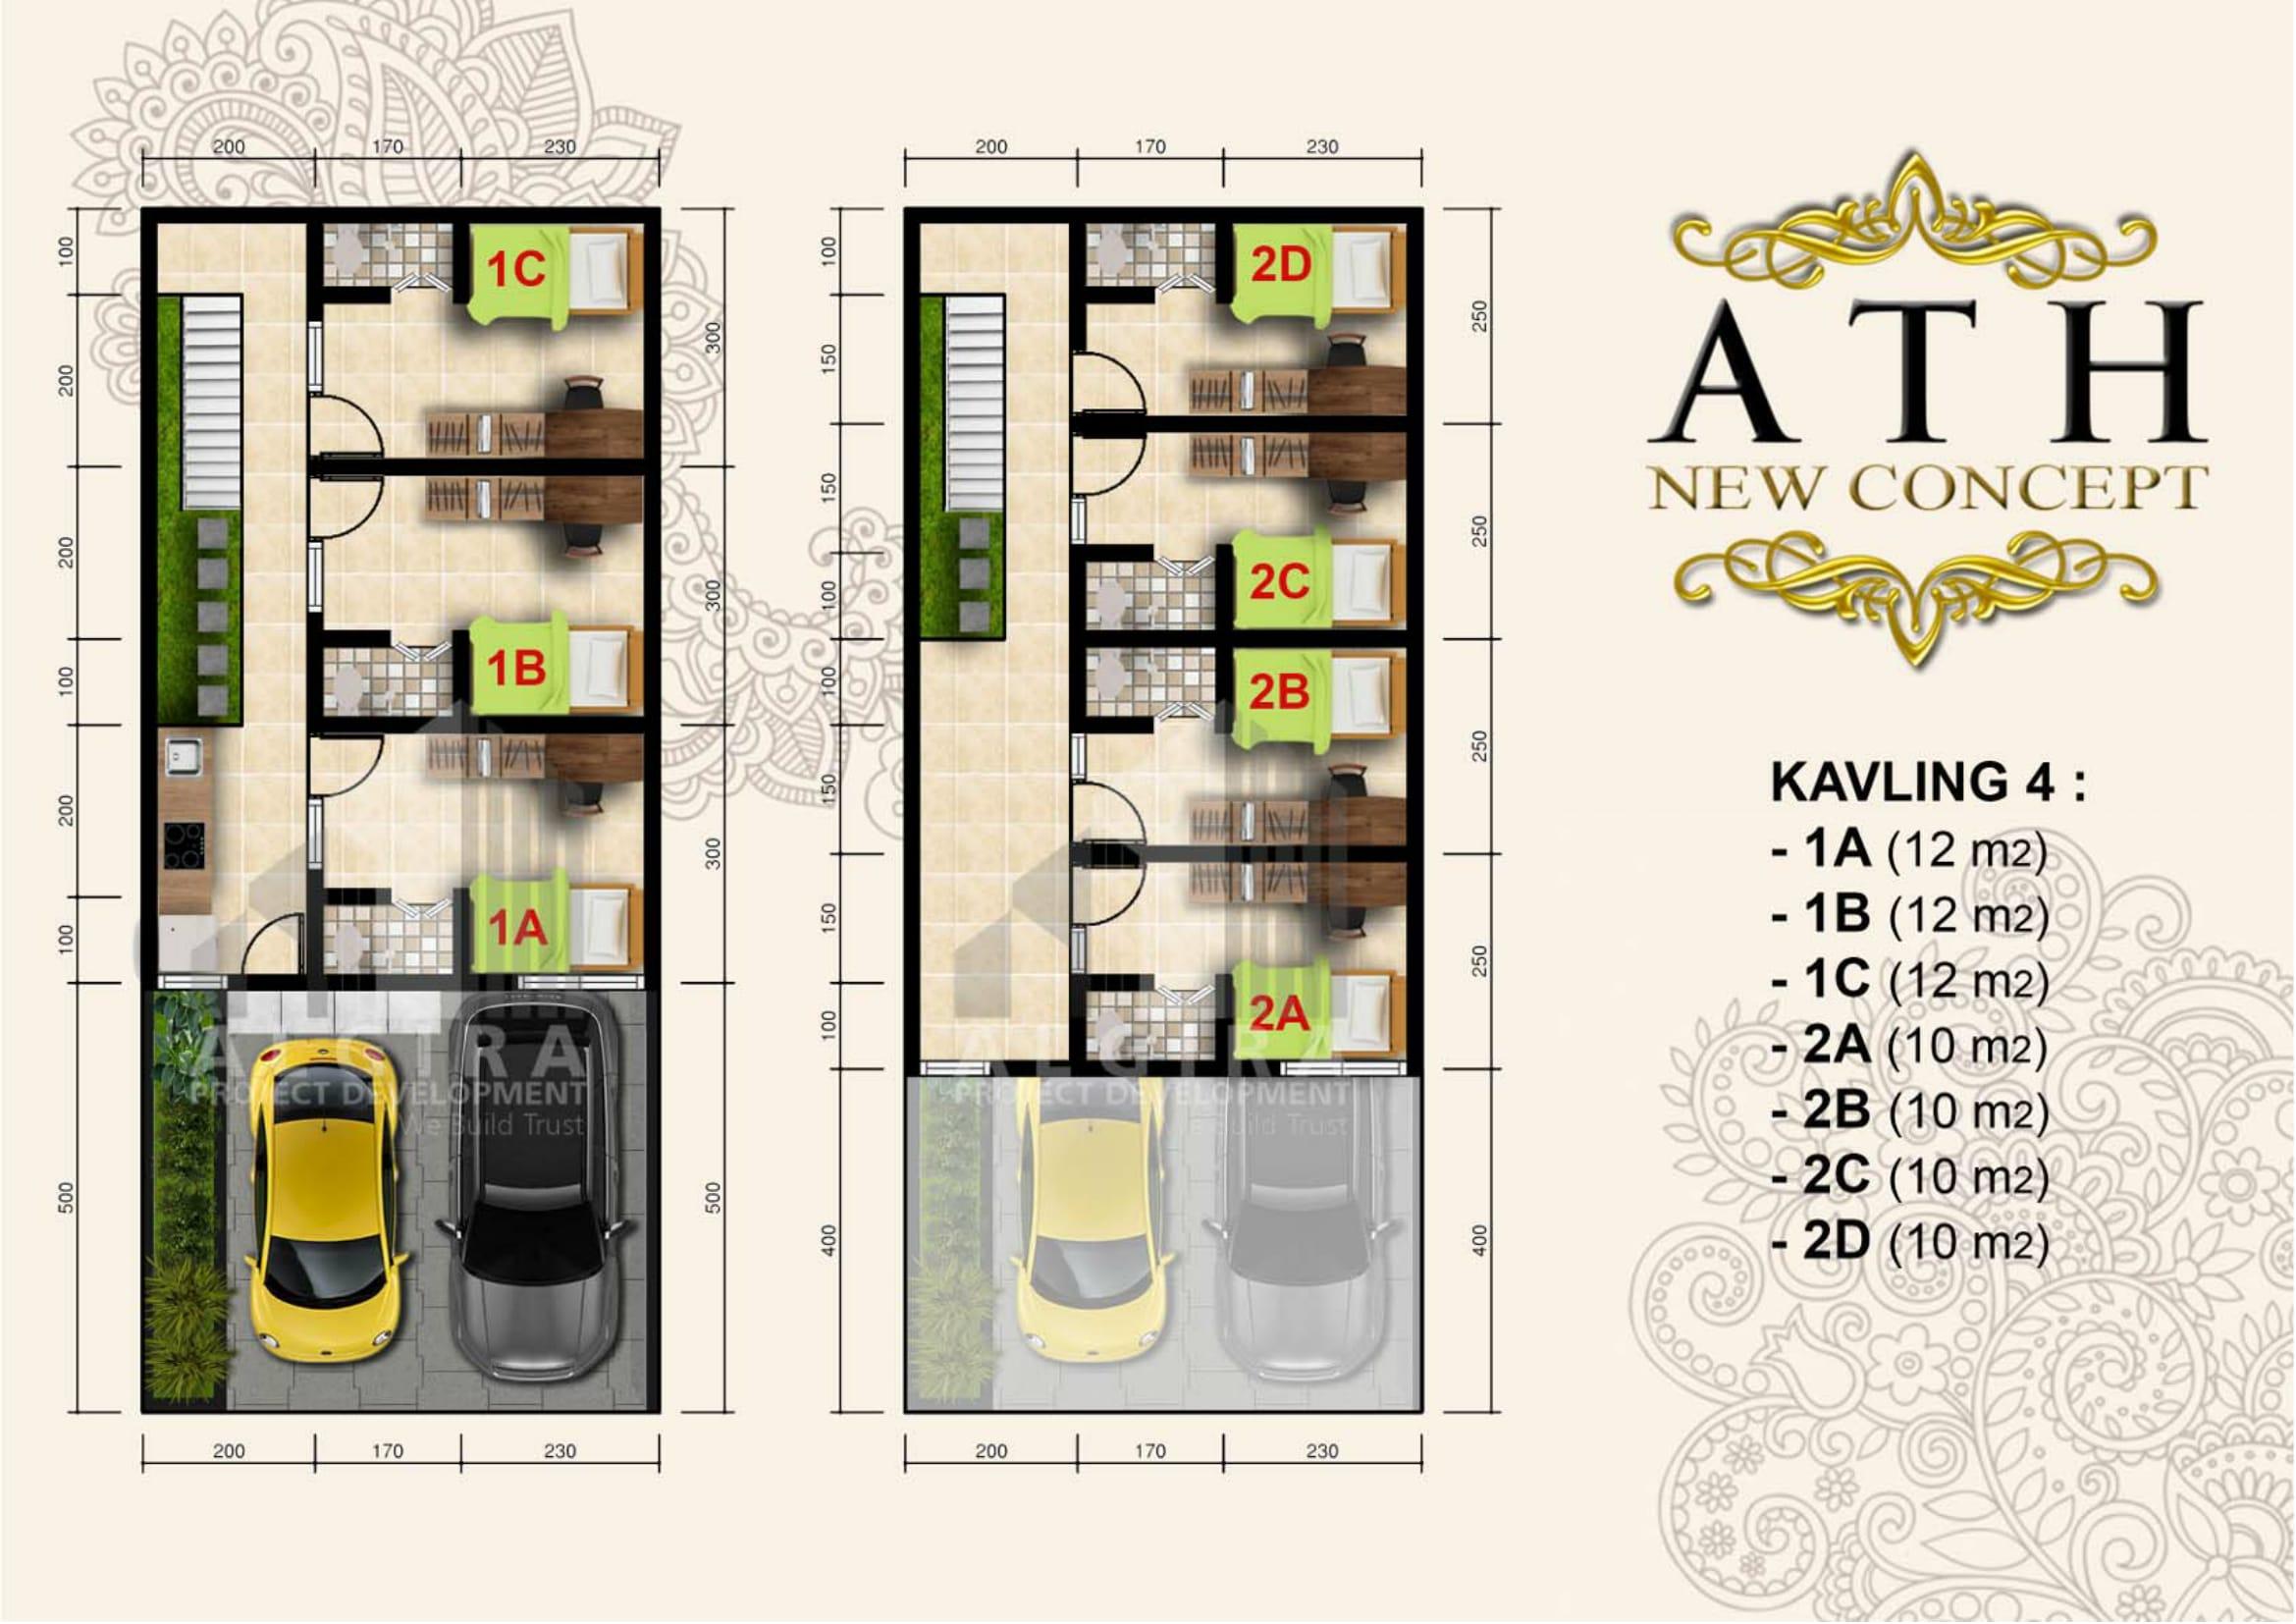 klikkprsyariah.ATH-new-concept-07